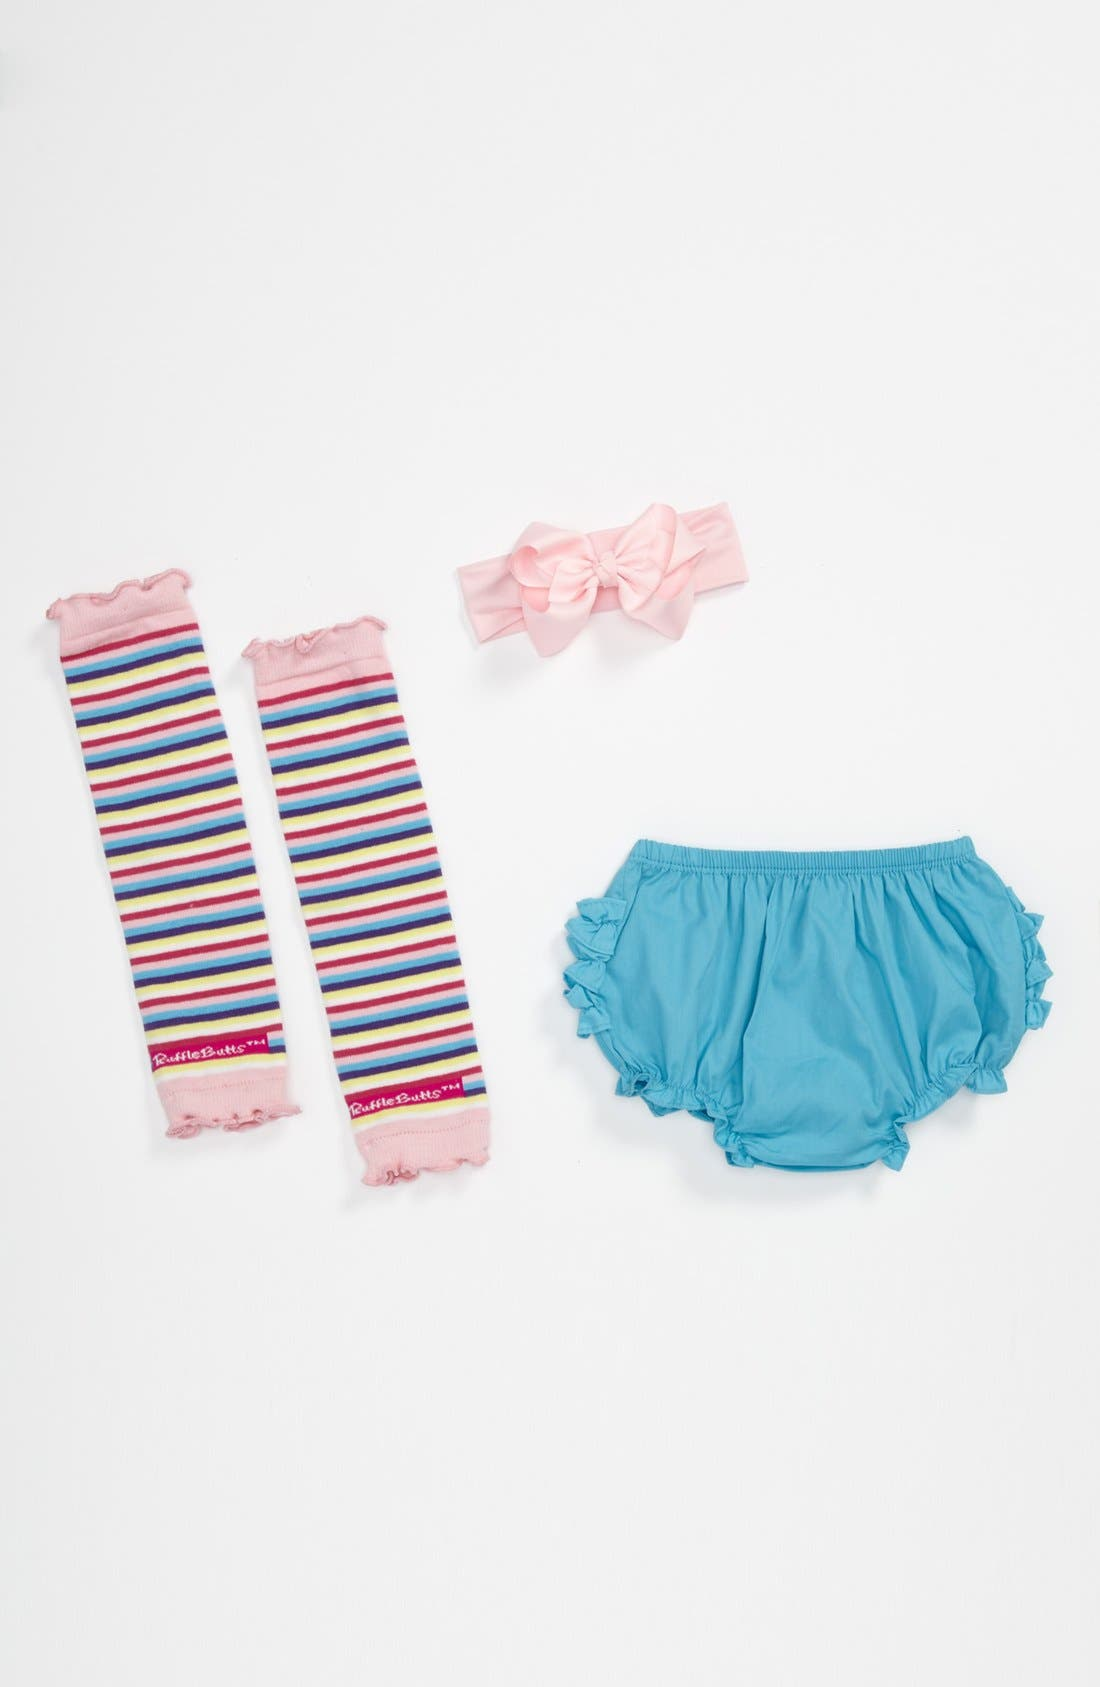 Main Image - RuffleButts 'Teal & Pink' Headband, Bloomers & Leg Warmers (Baby)